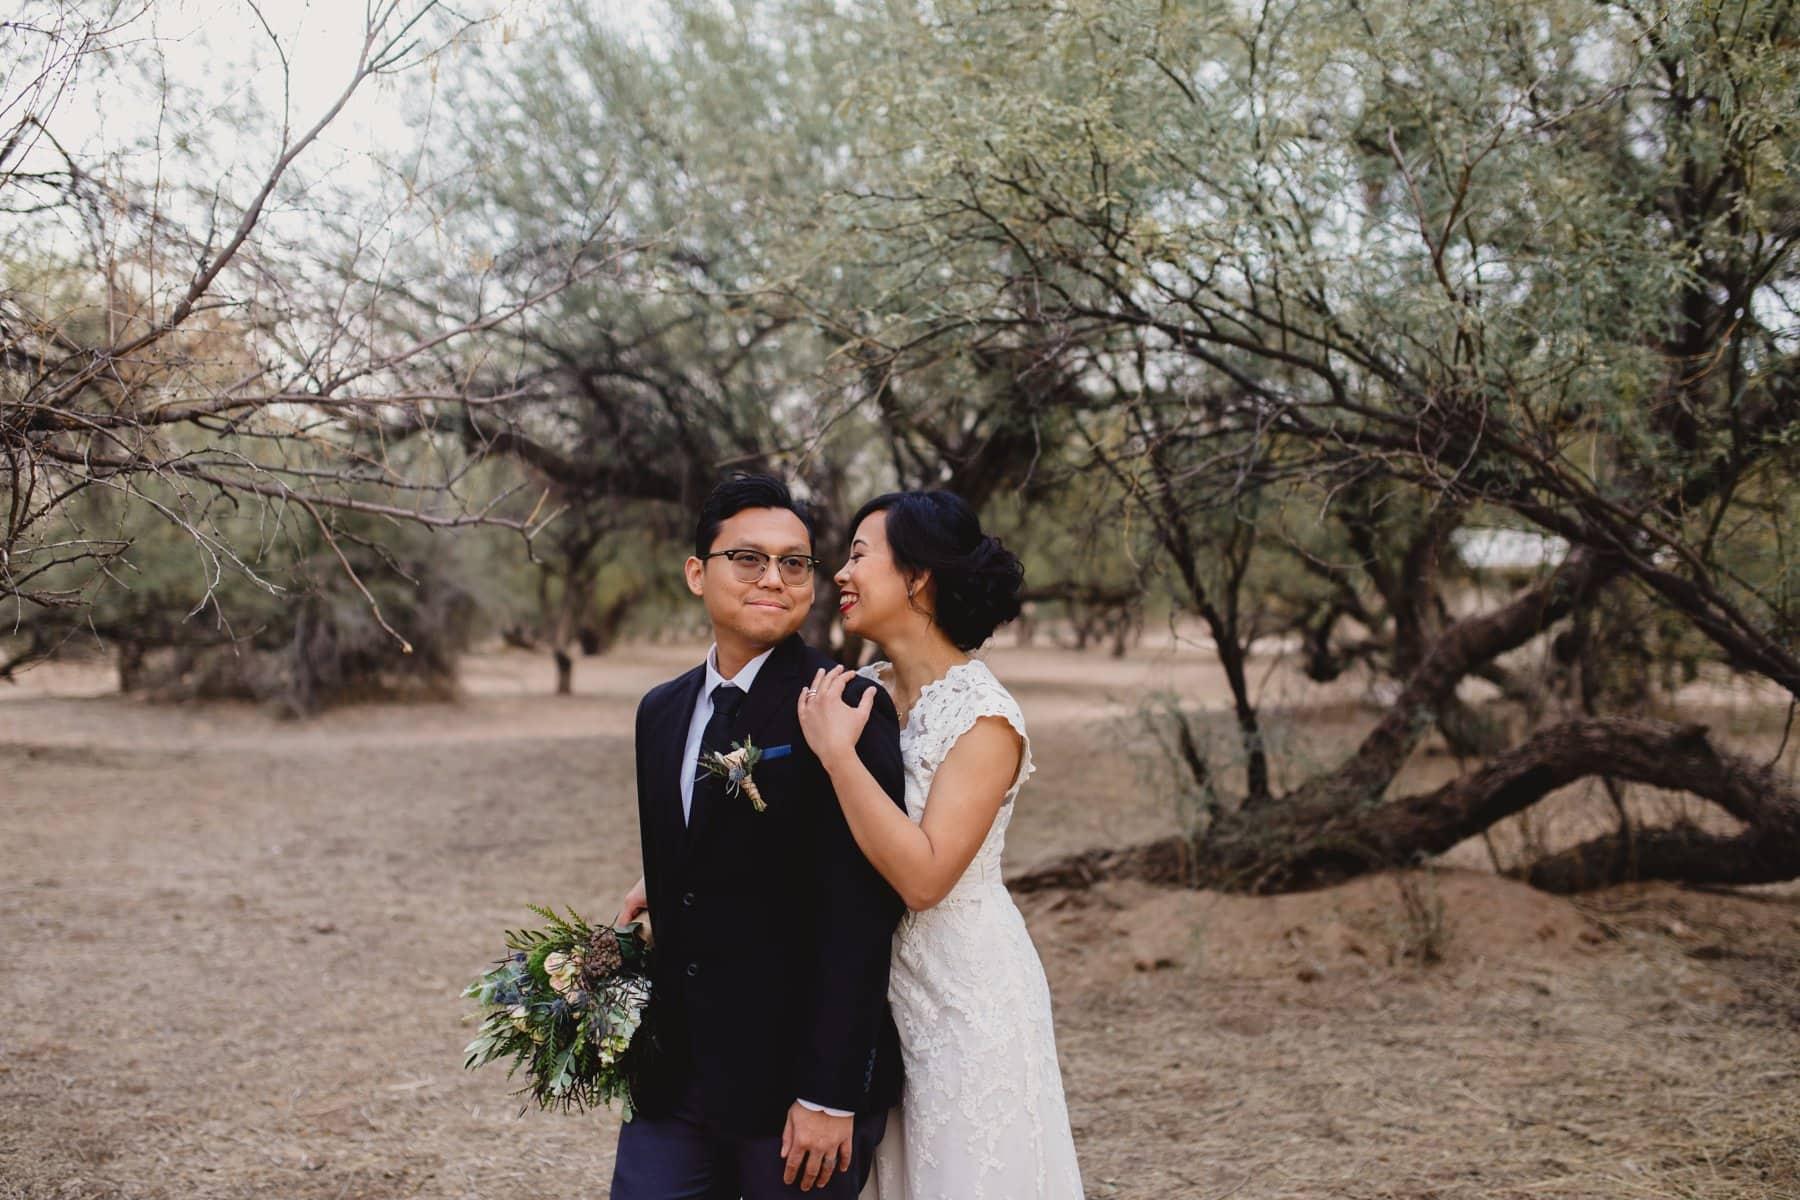 Salt River outdoor wedding photos